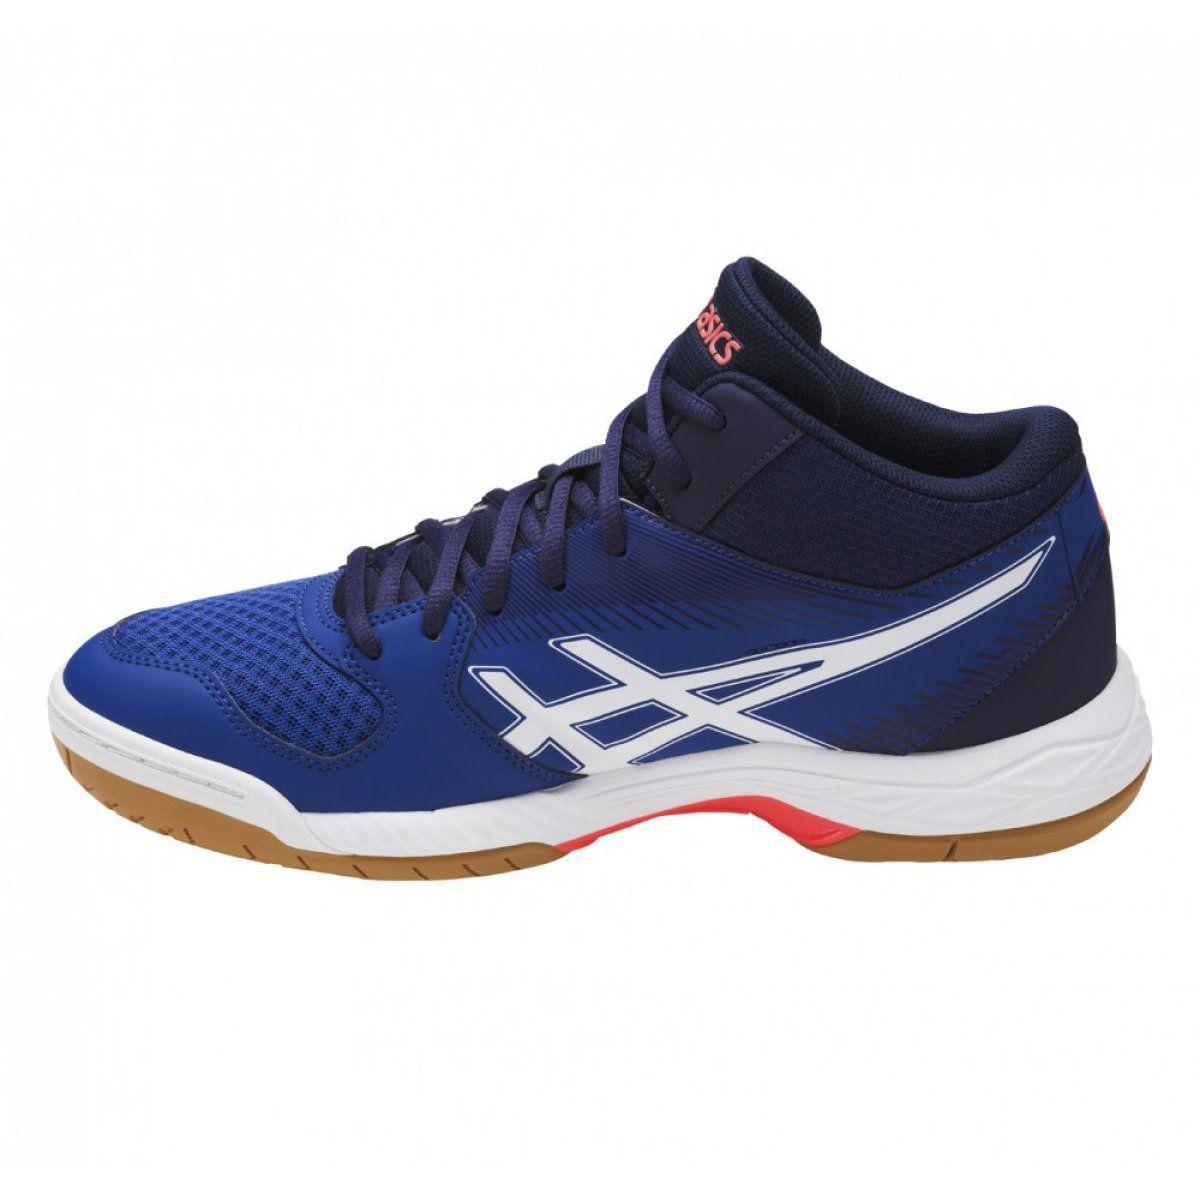 Asics Gel Task M B703y 4901 Blue Multicolored Asics Gel Asics Volleyball Shoes